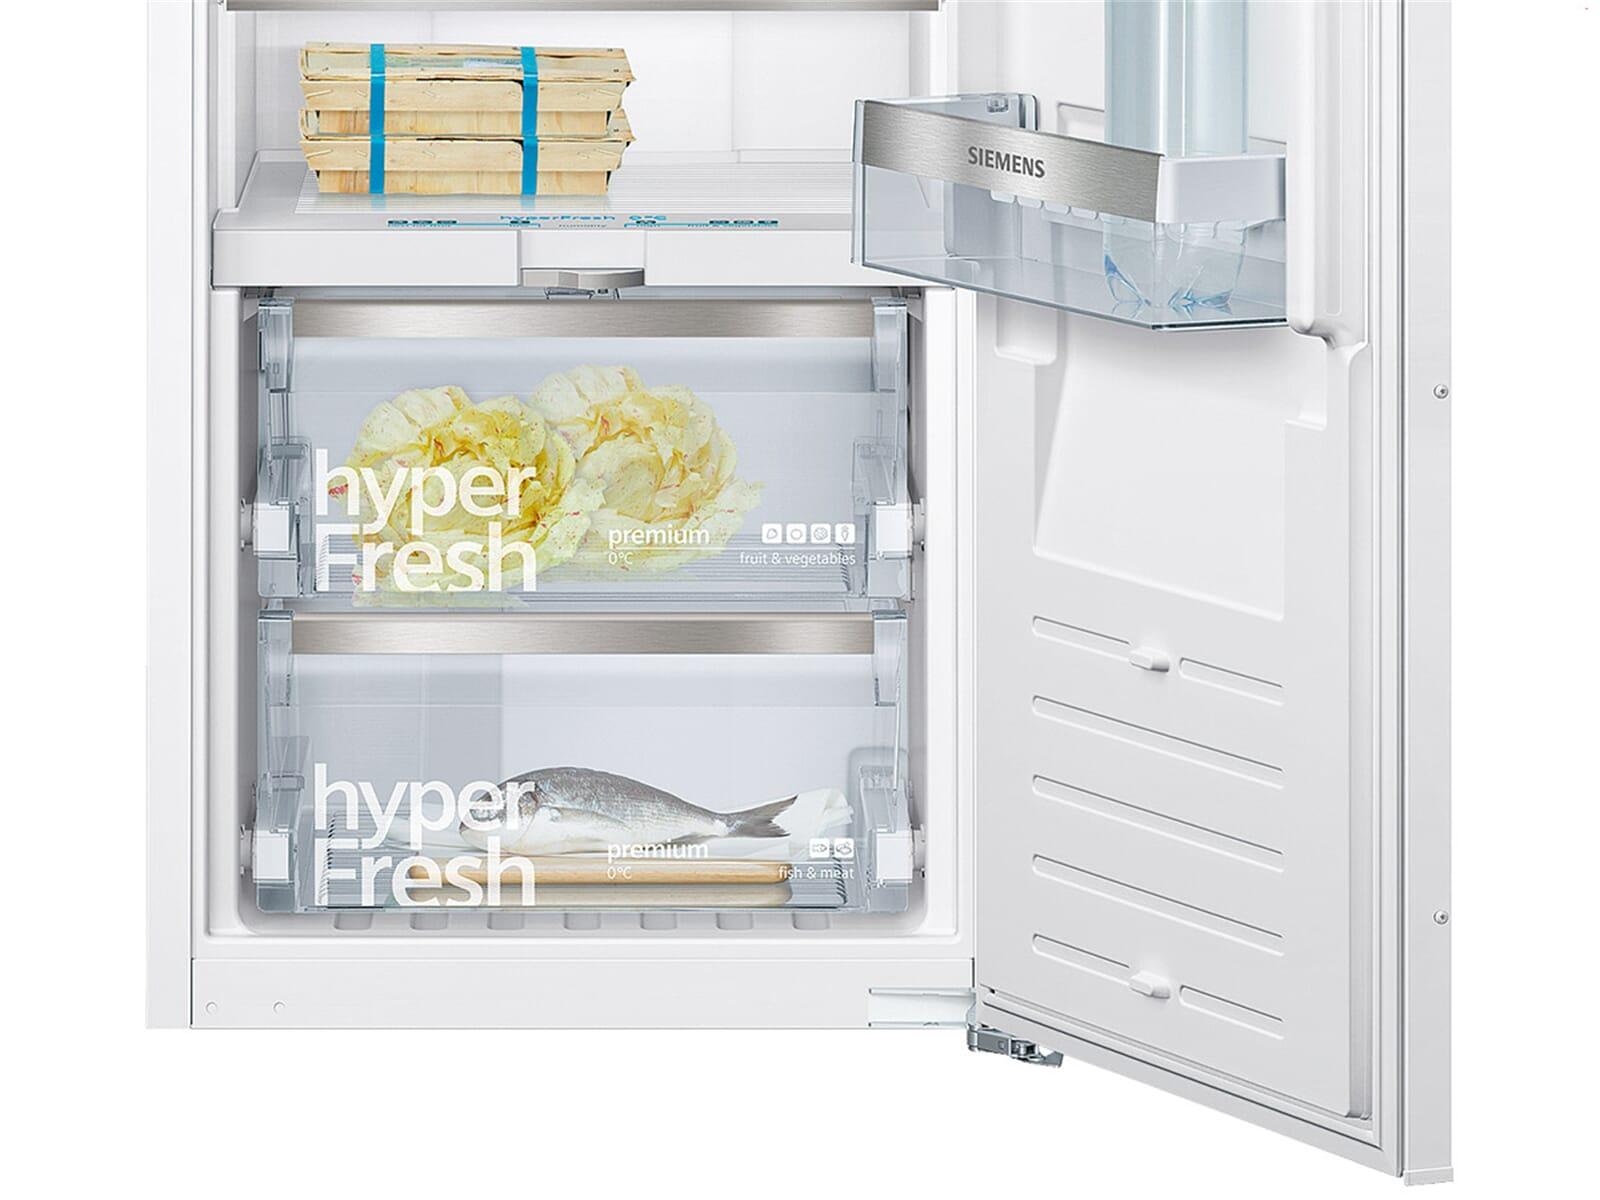 Siemens KI52FAD30 Einbaukühlschrank